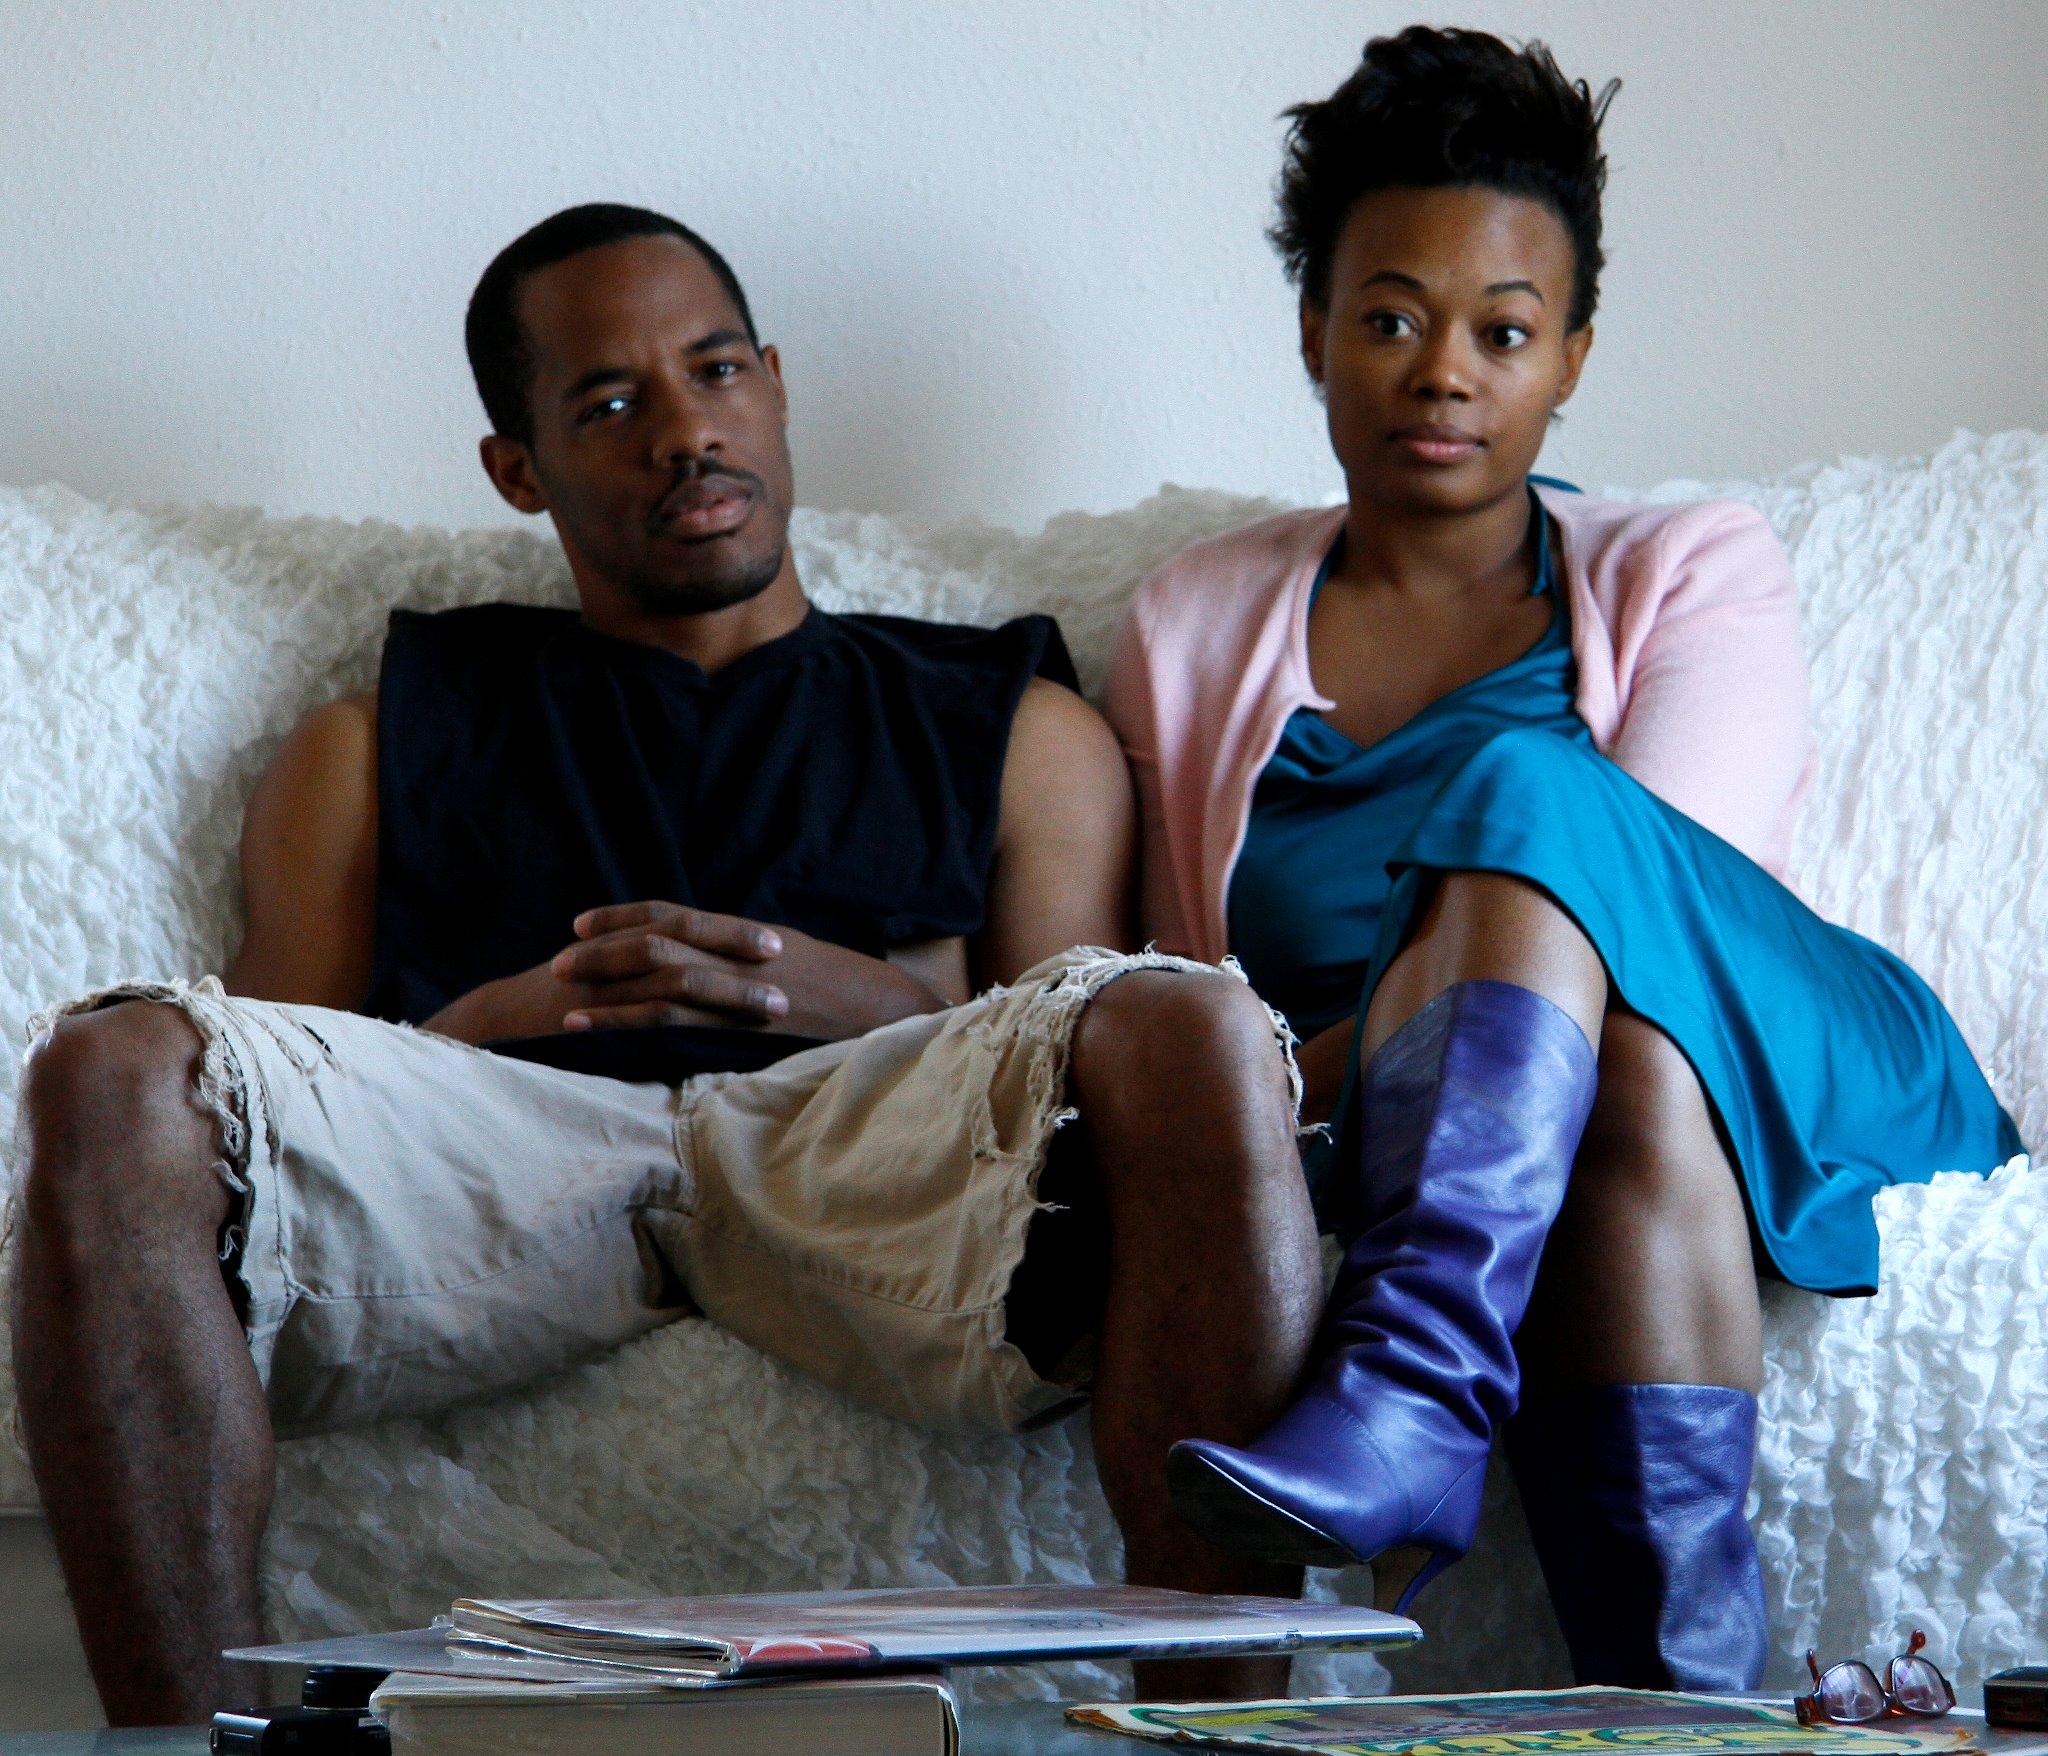 Numa Perrier and Desmond Faison in The Couple (2011)